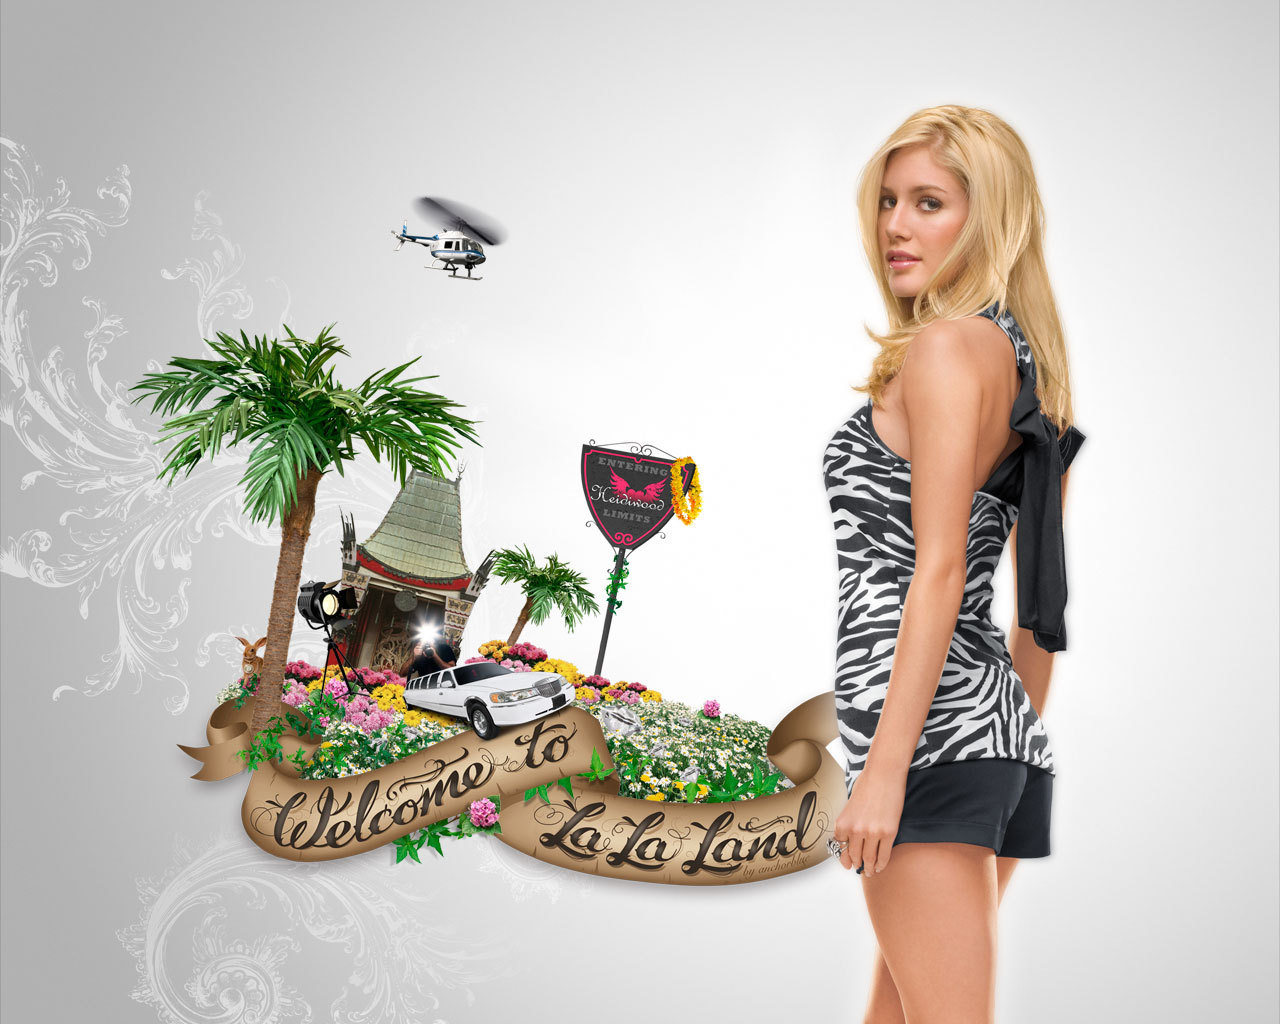 http://images1.fanpop.com/images/photos/1300000/Heidiwood-heidi-montag-1395702-1280-1024.jpg